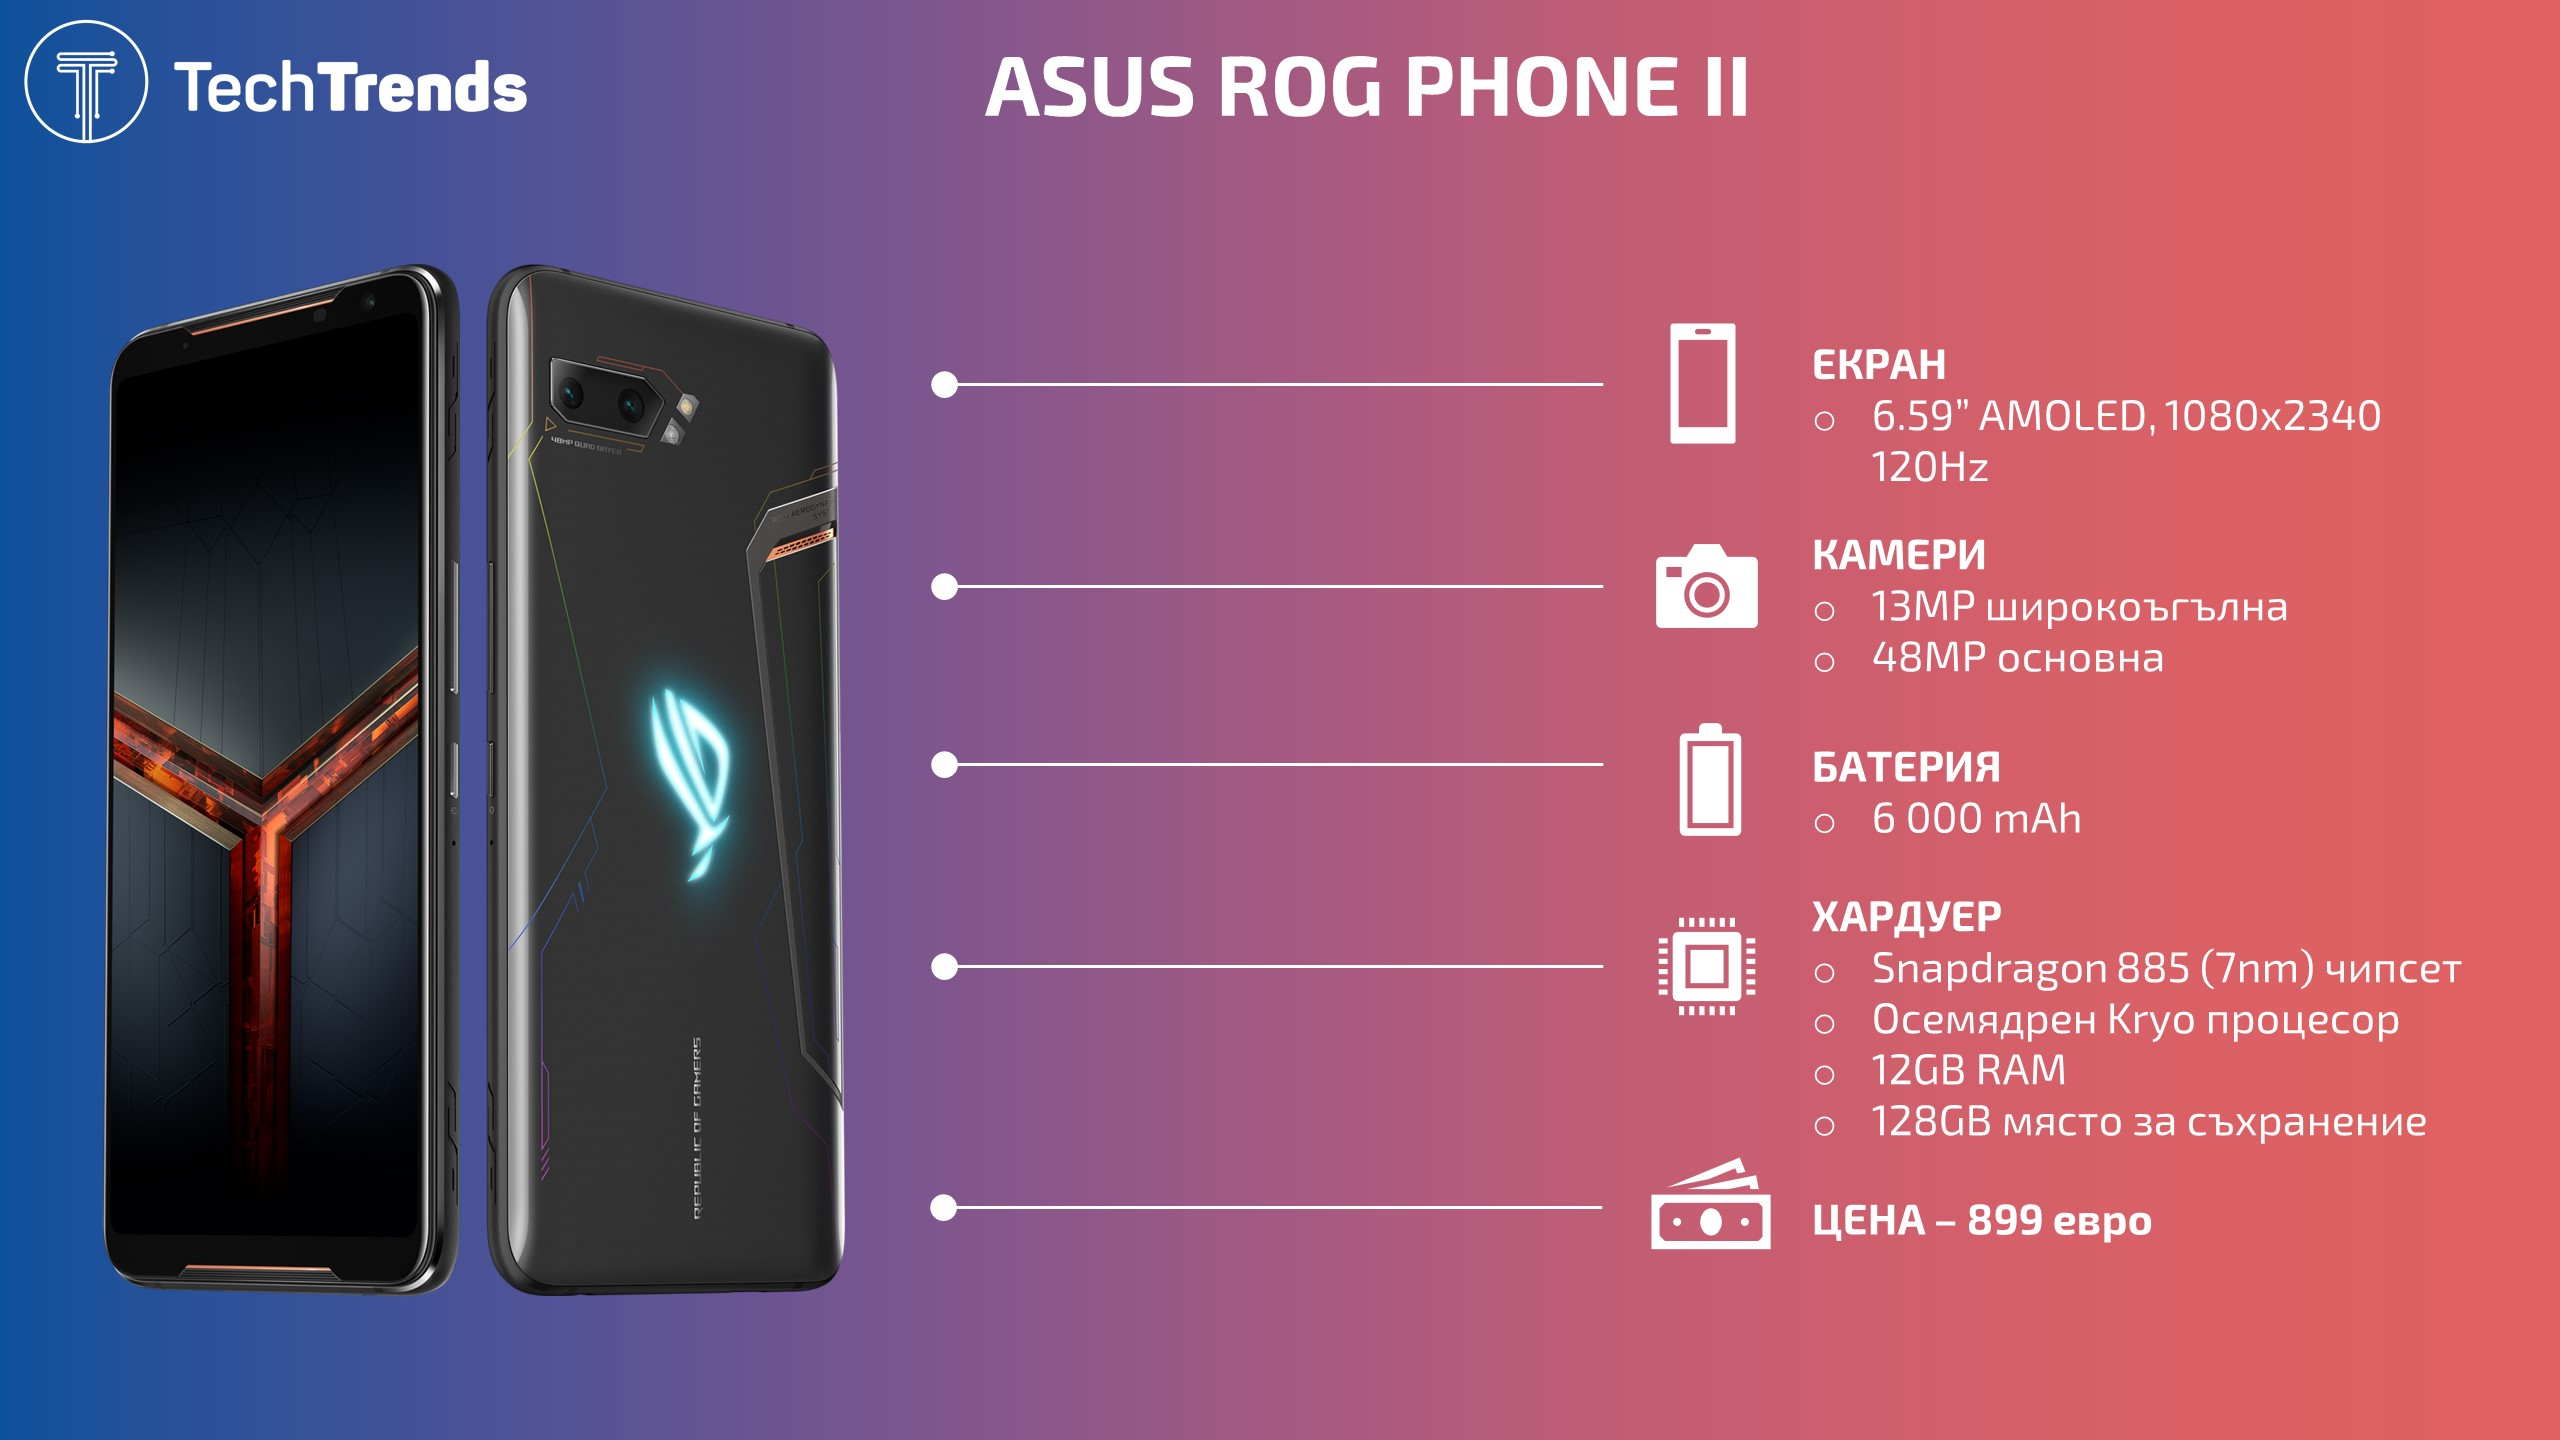 Asus ROG Phone II Infographic